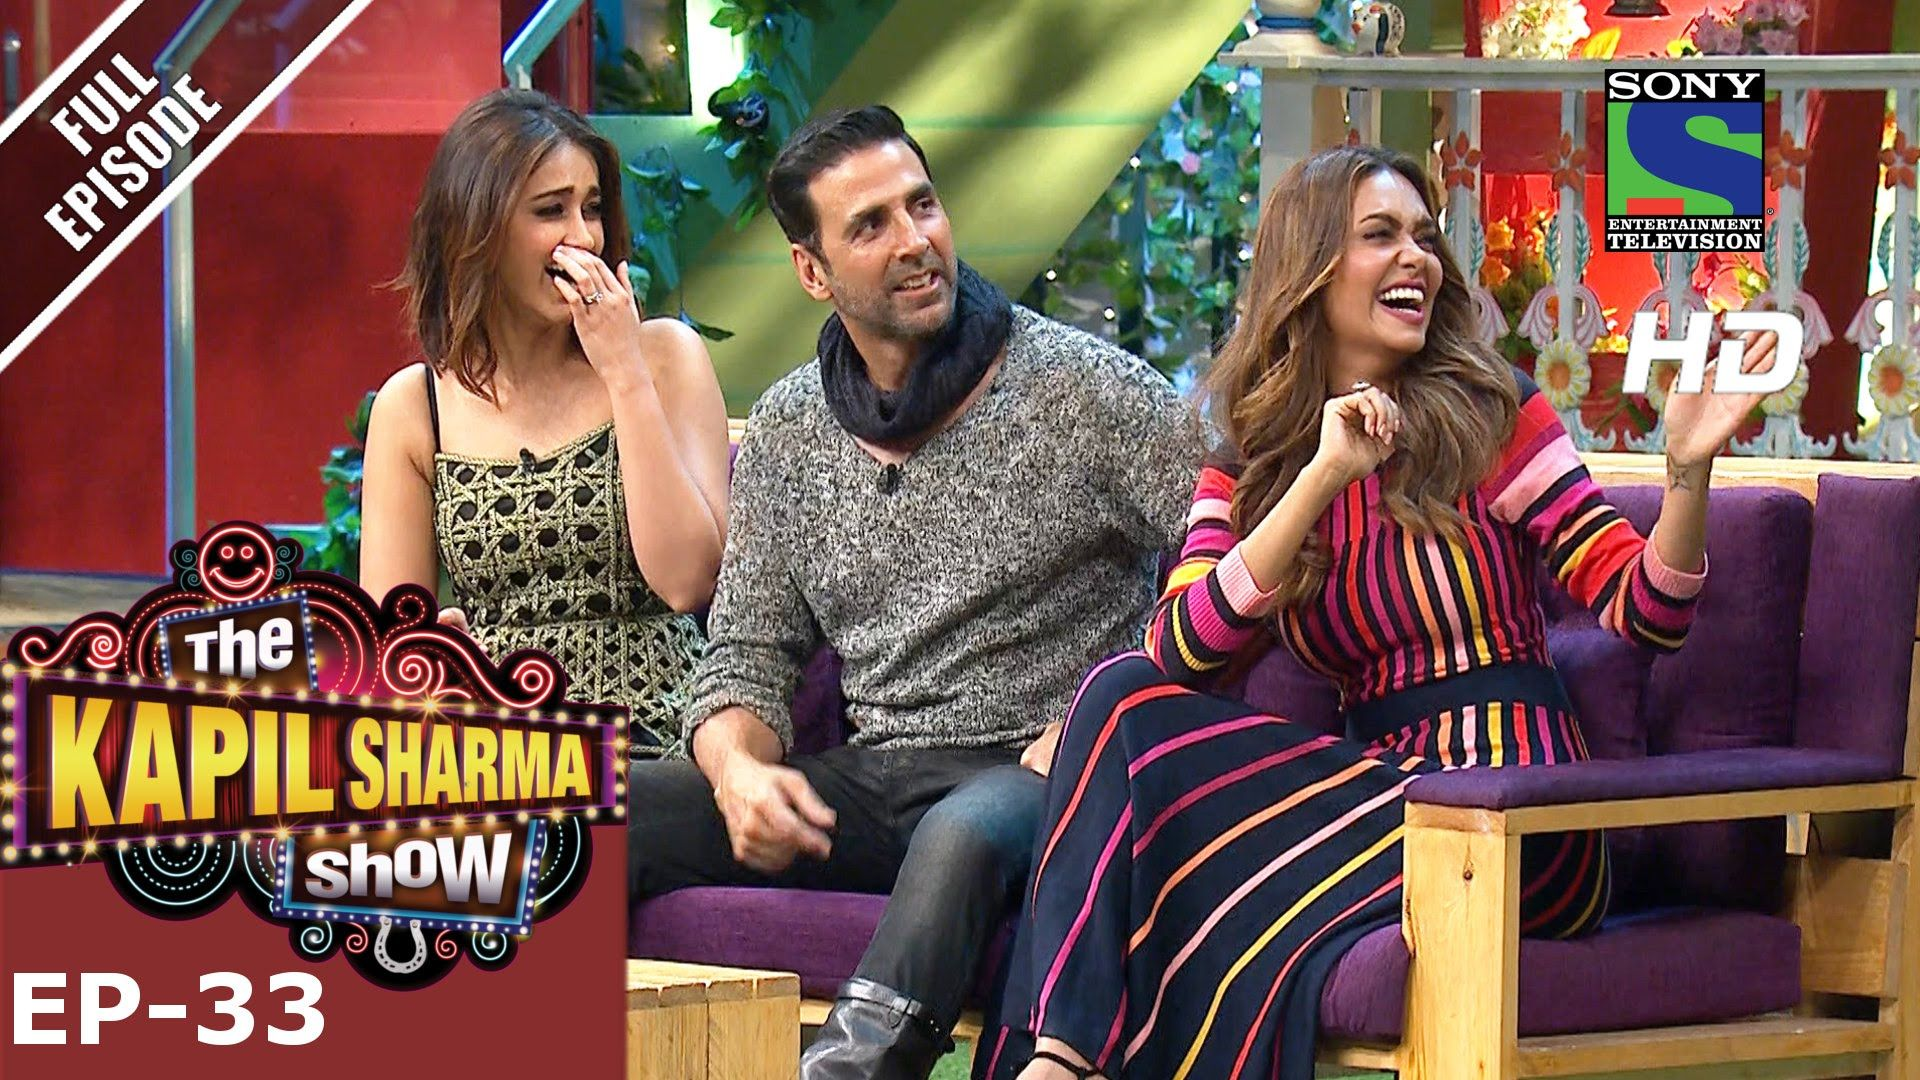 The Kapil Sharma Show - दी कपिल शर्मा शो